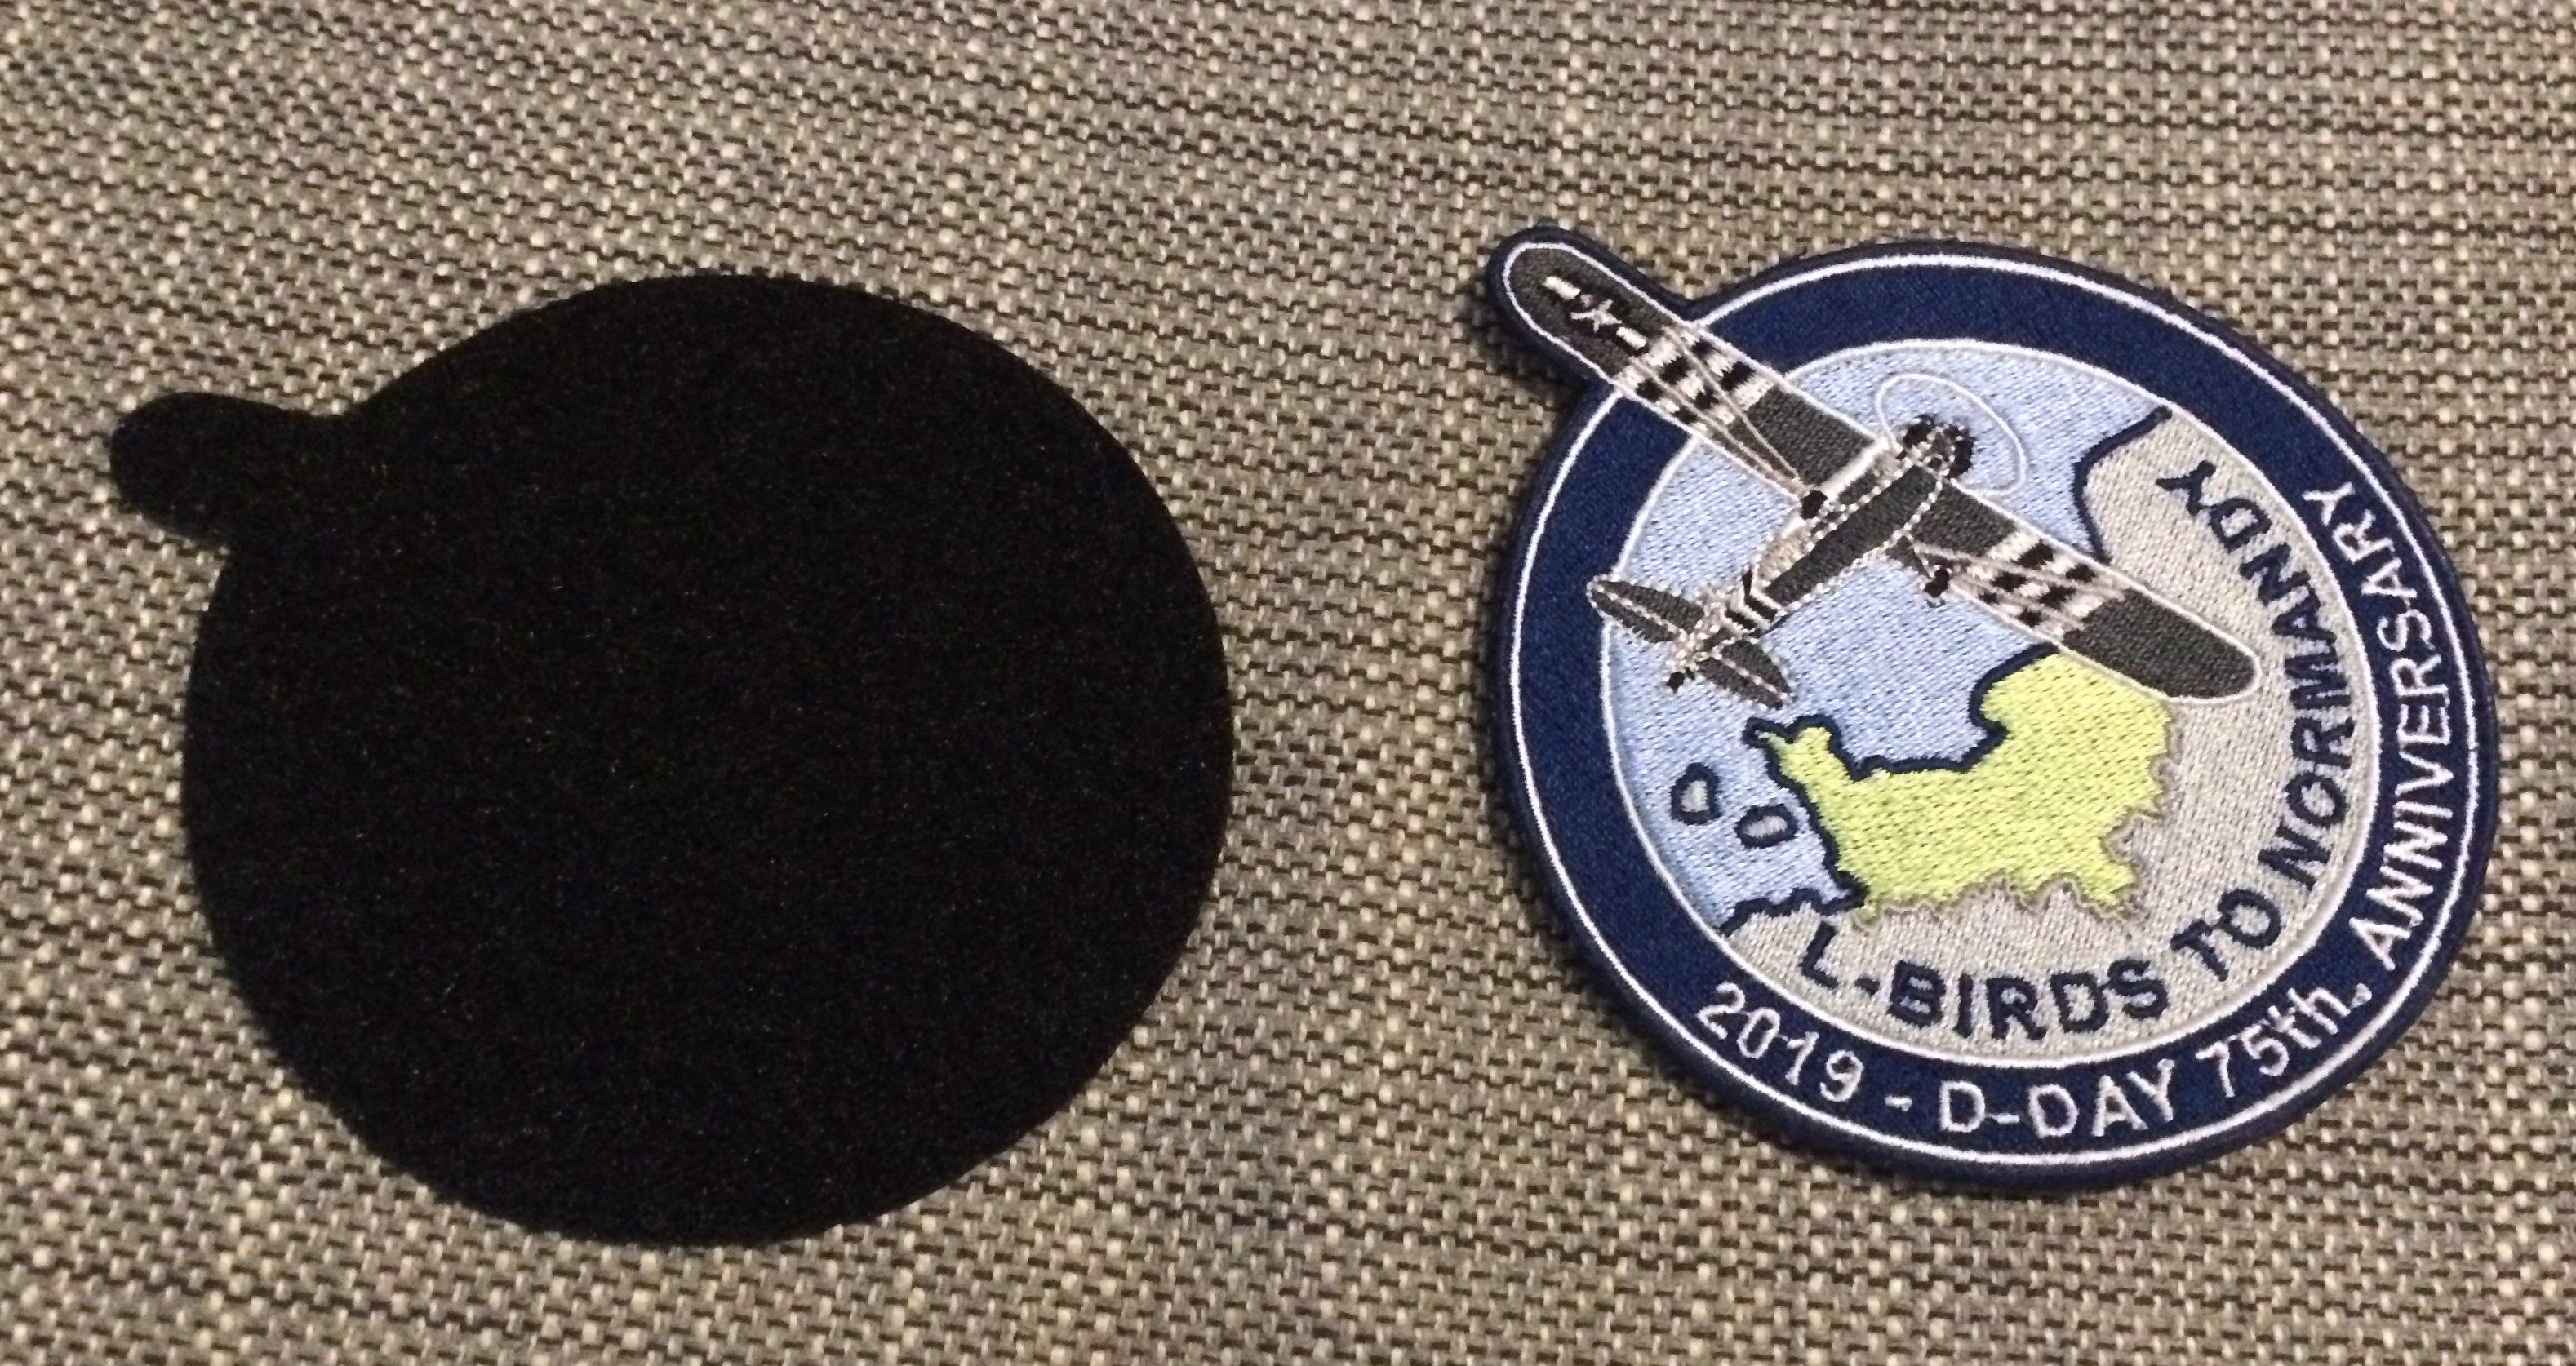 Patch L-Birds back to Normandy